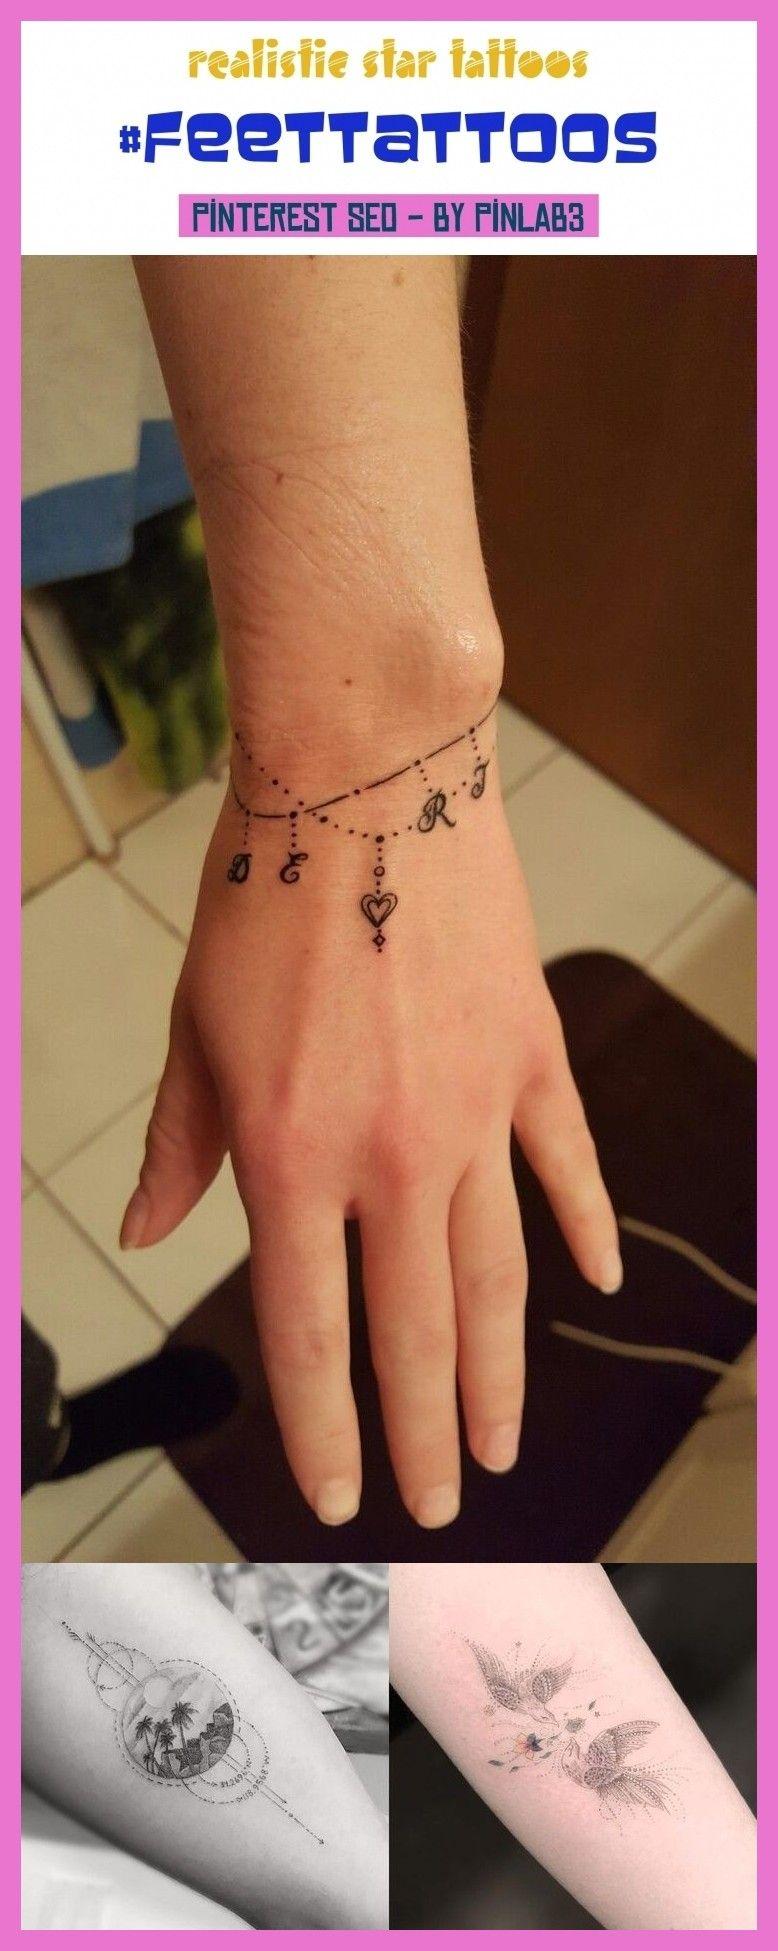 Realistic star tattoos realistische Sternentattoos | tatouages étoiles réalistes | tatuajes de estrellas realistas | star